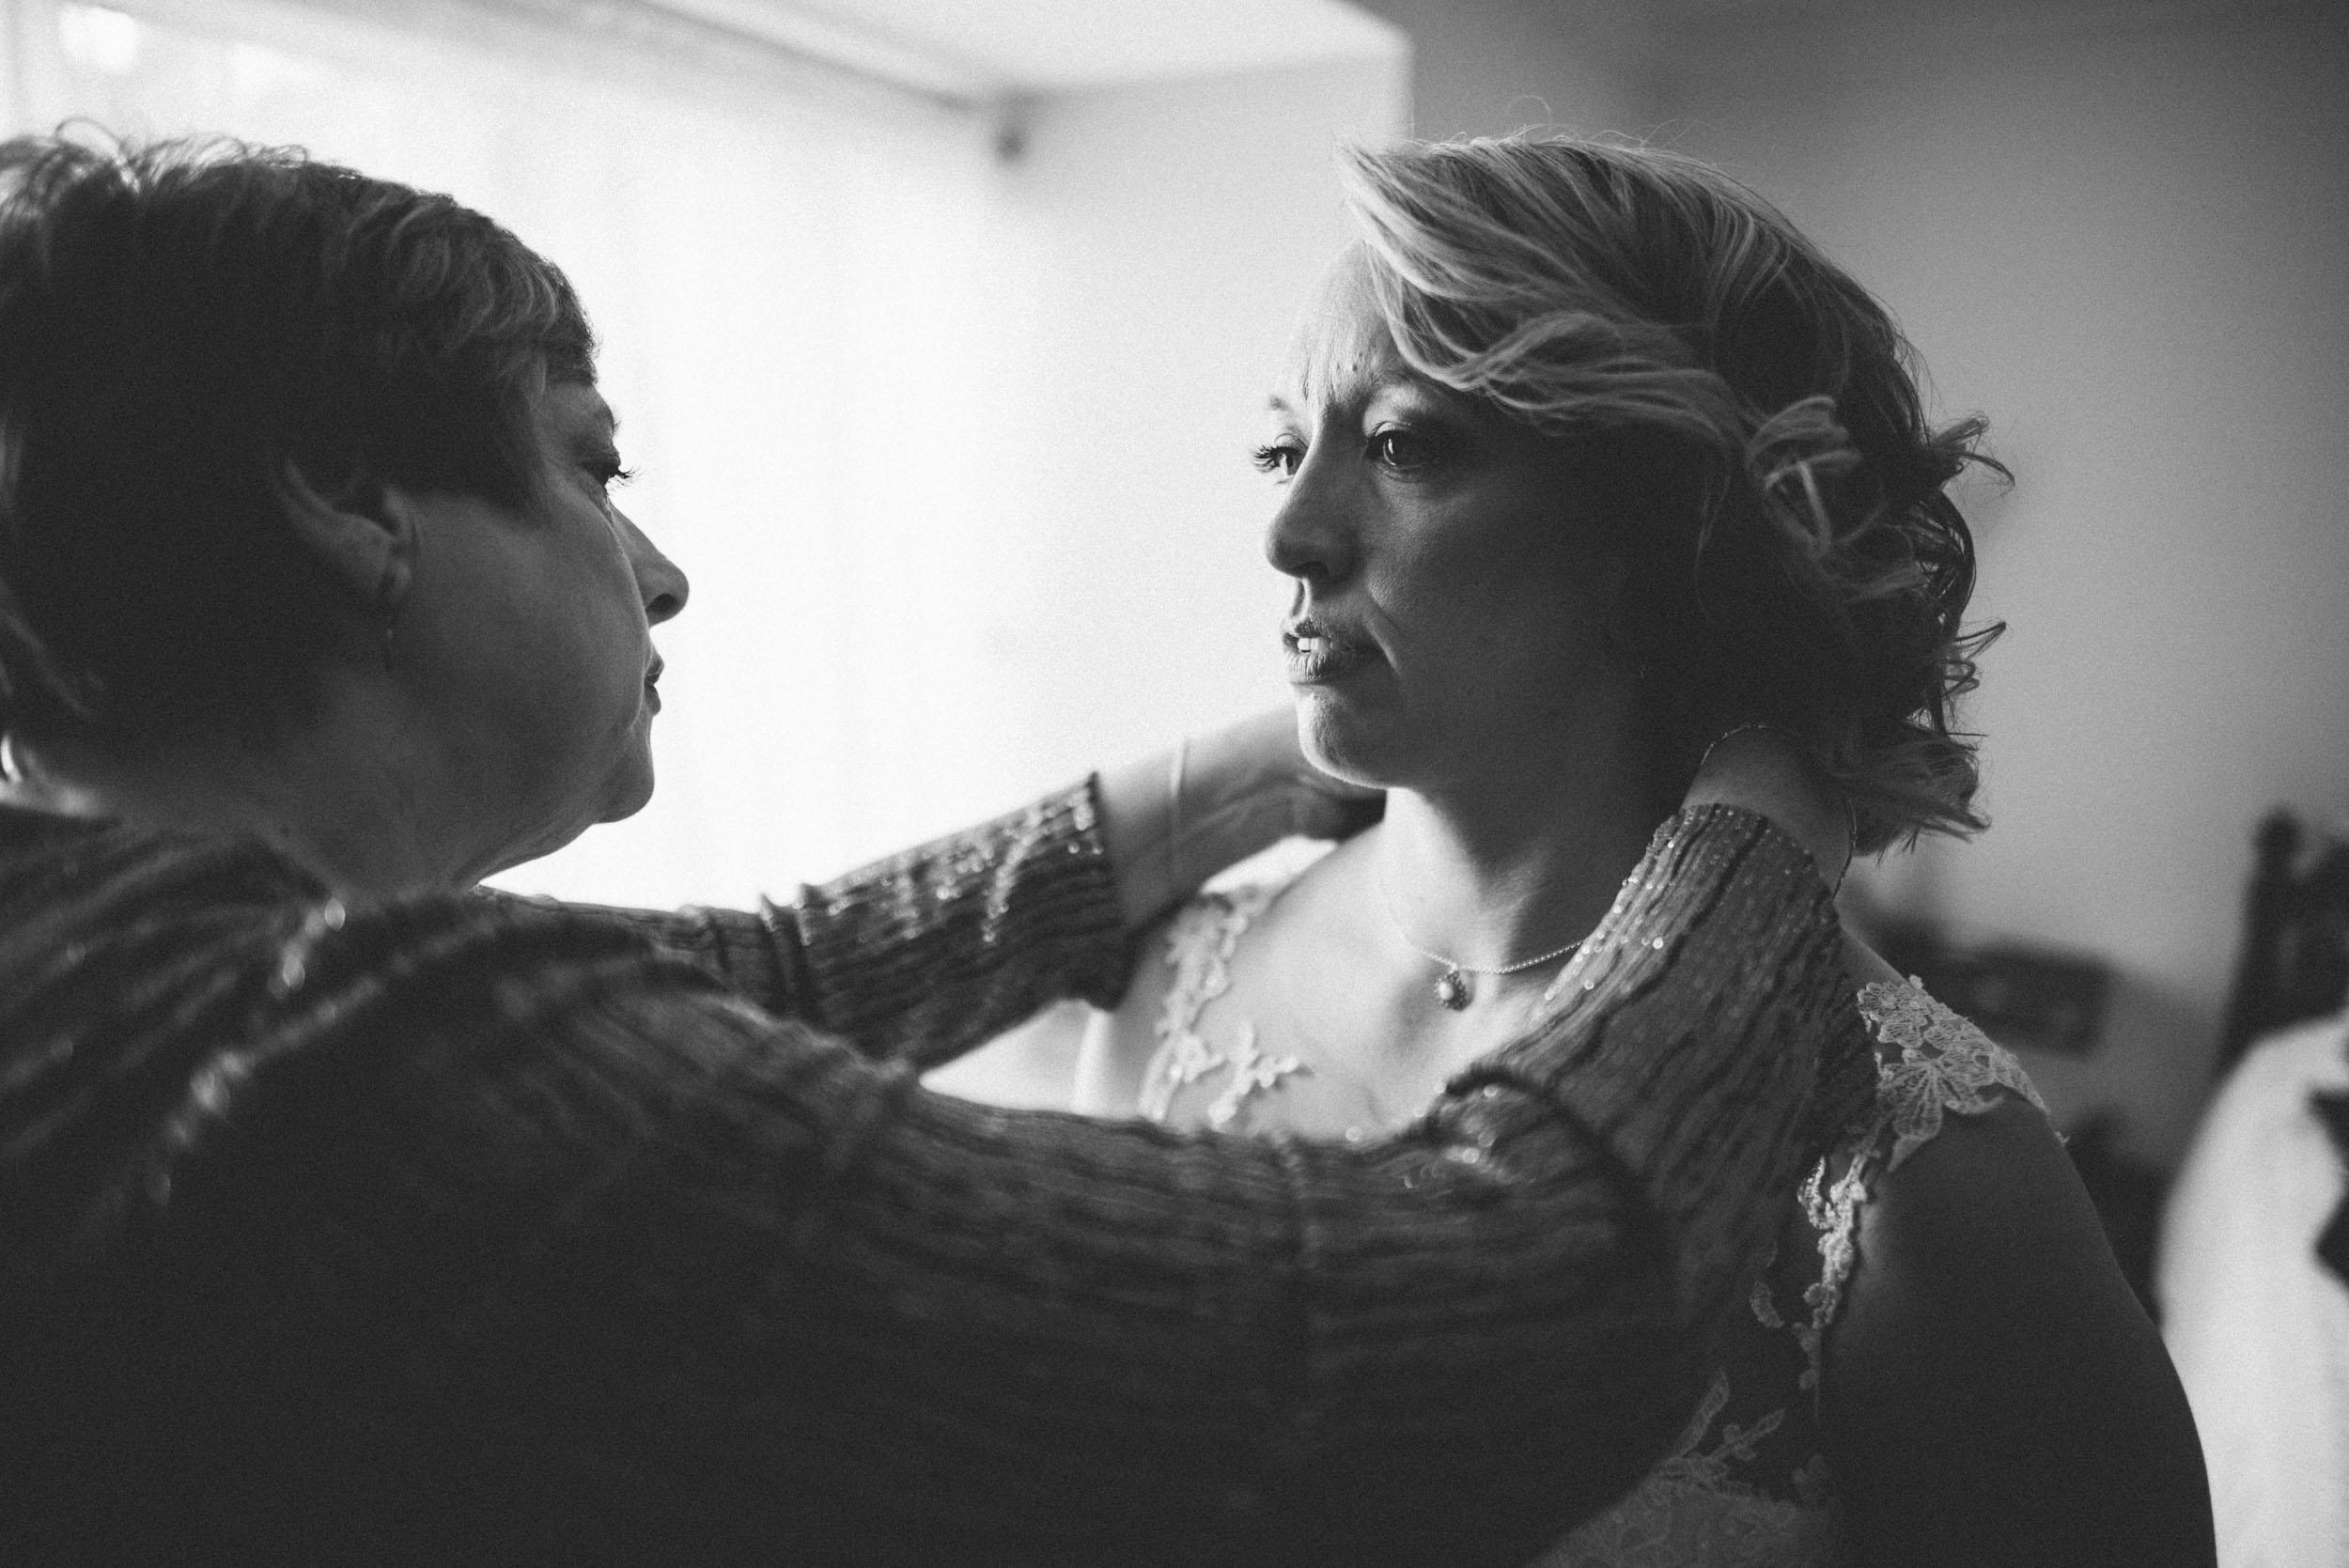 Gaie-Lea-Staunton-weddding-photographer-38.jpg